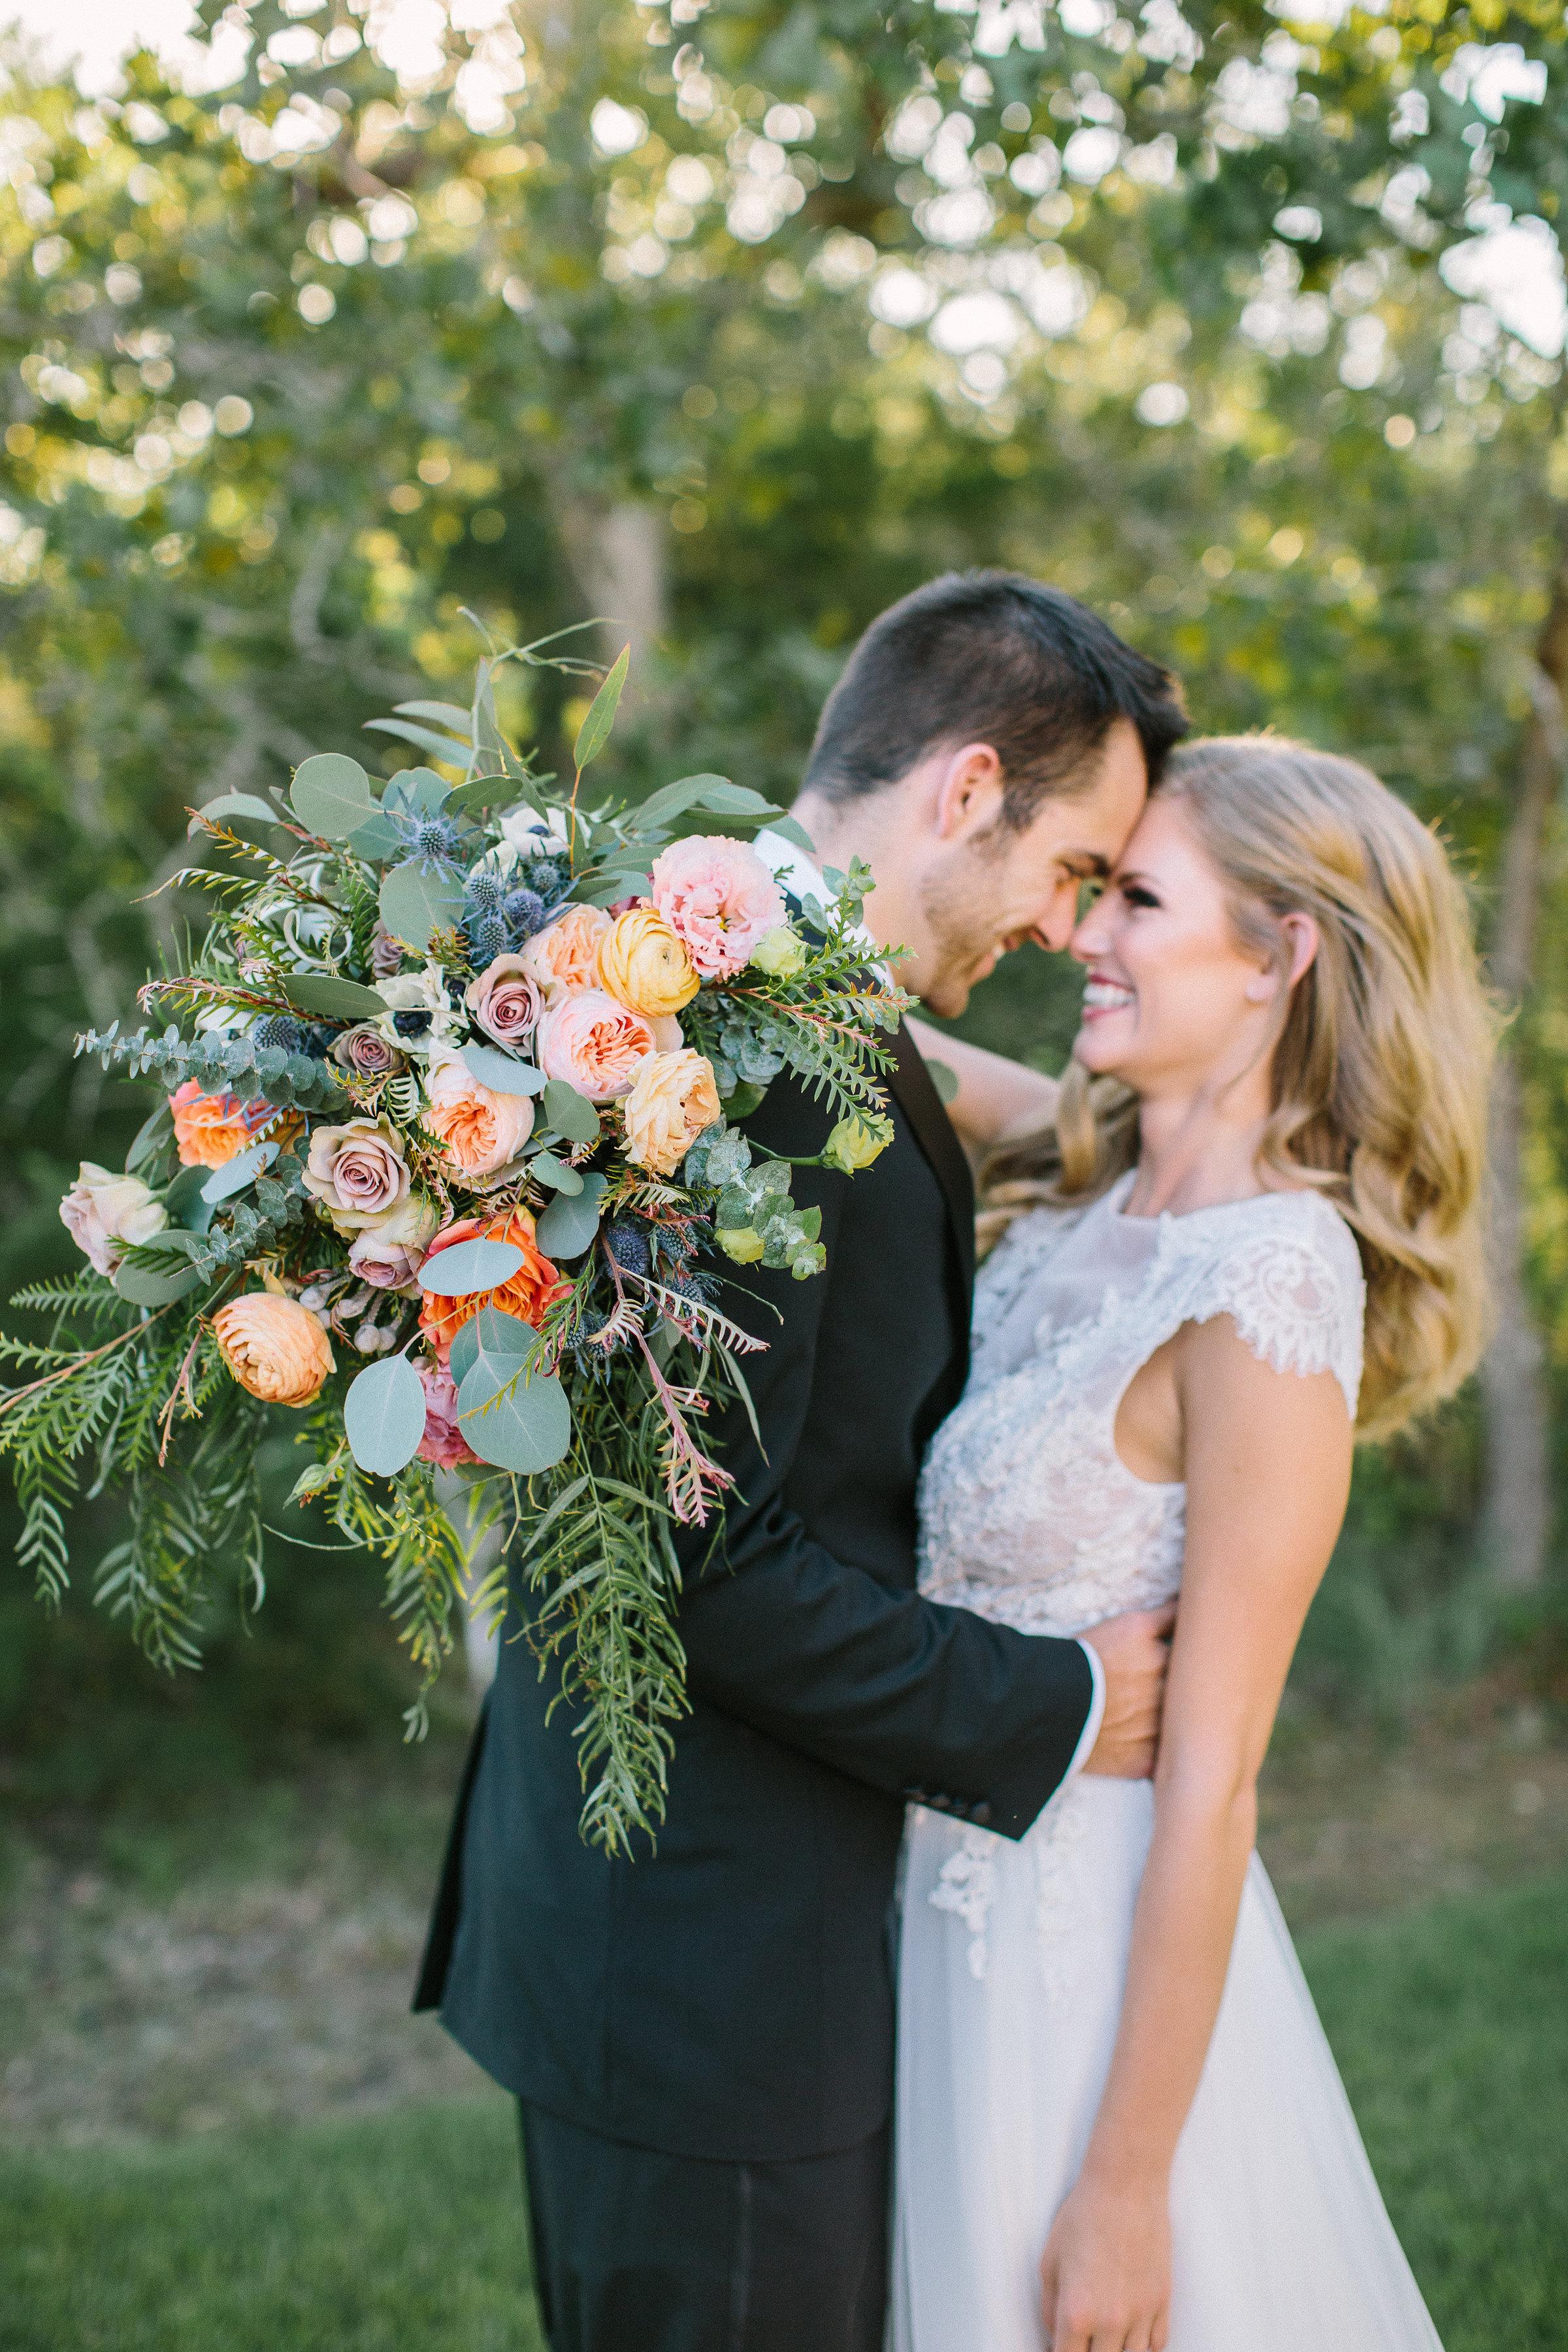 Ellen-Ashton-Photography-Peach-Creek-Ranch-Weddings-Wed-and-Prosper230